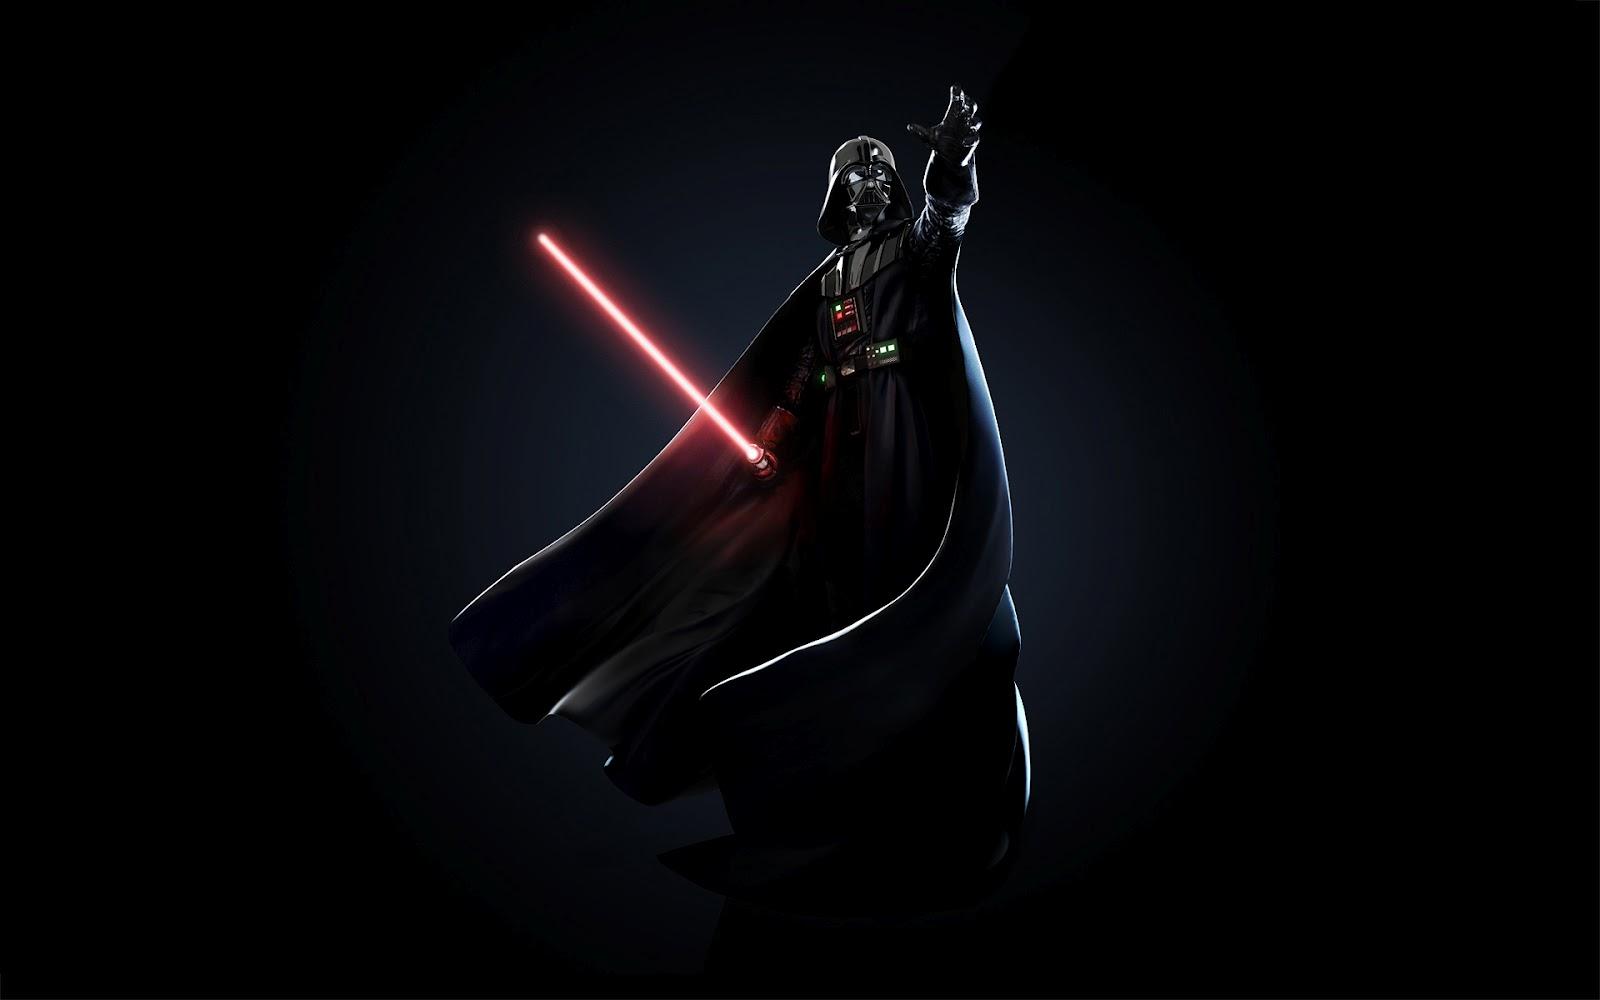 Star Wars Wallpaper 2266